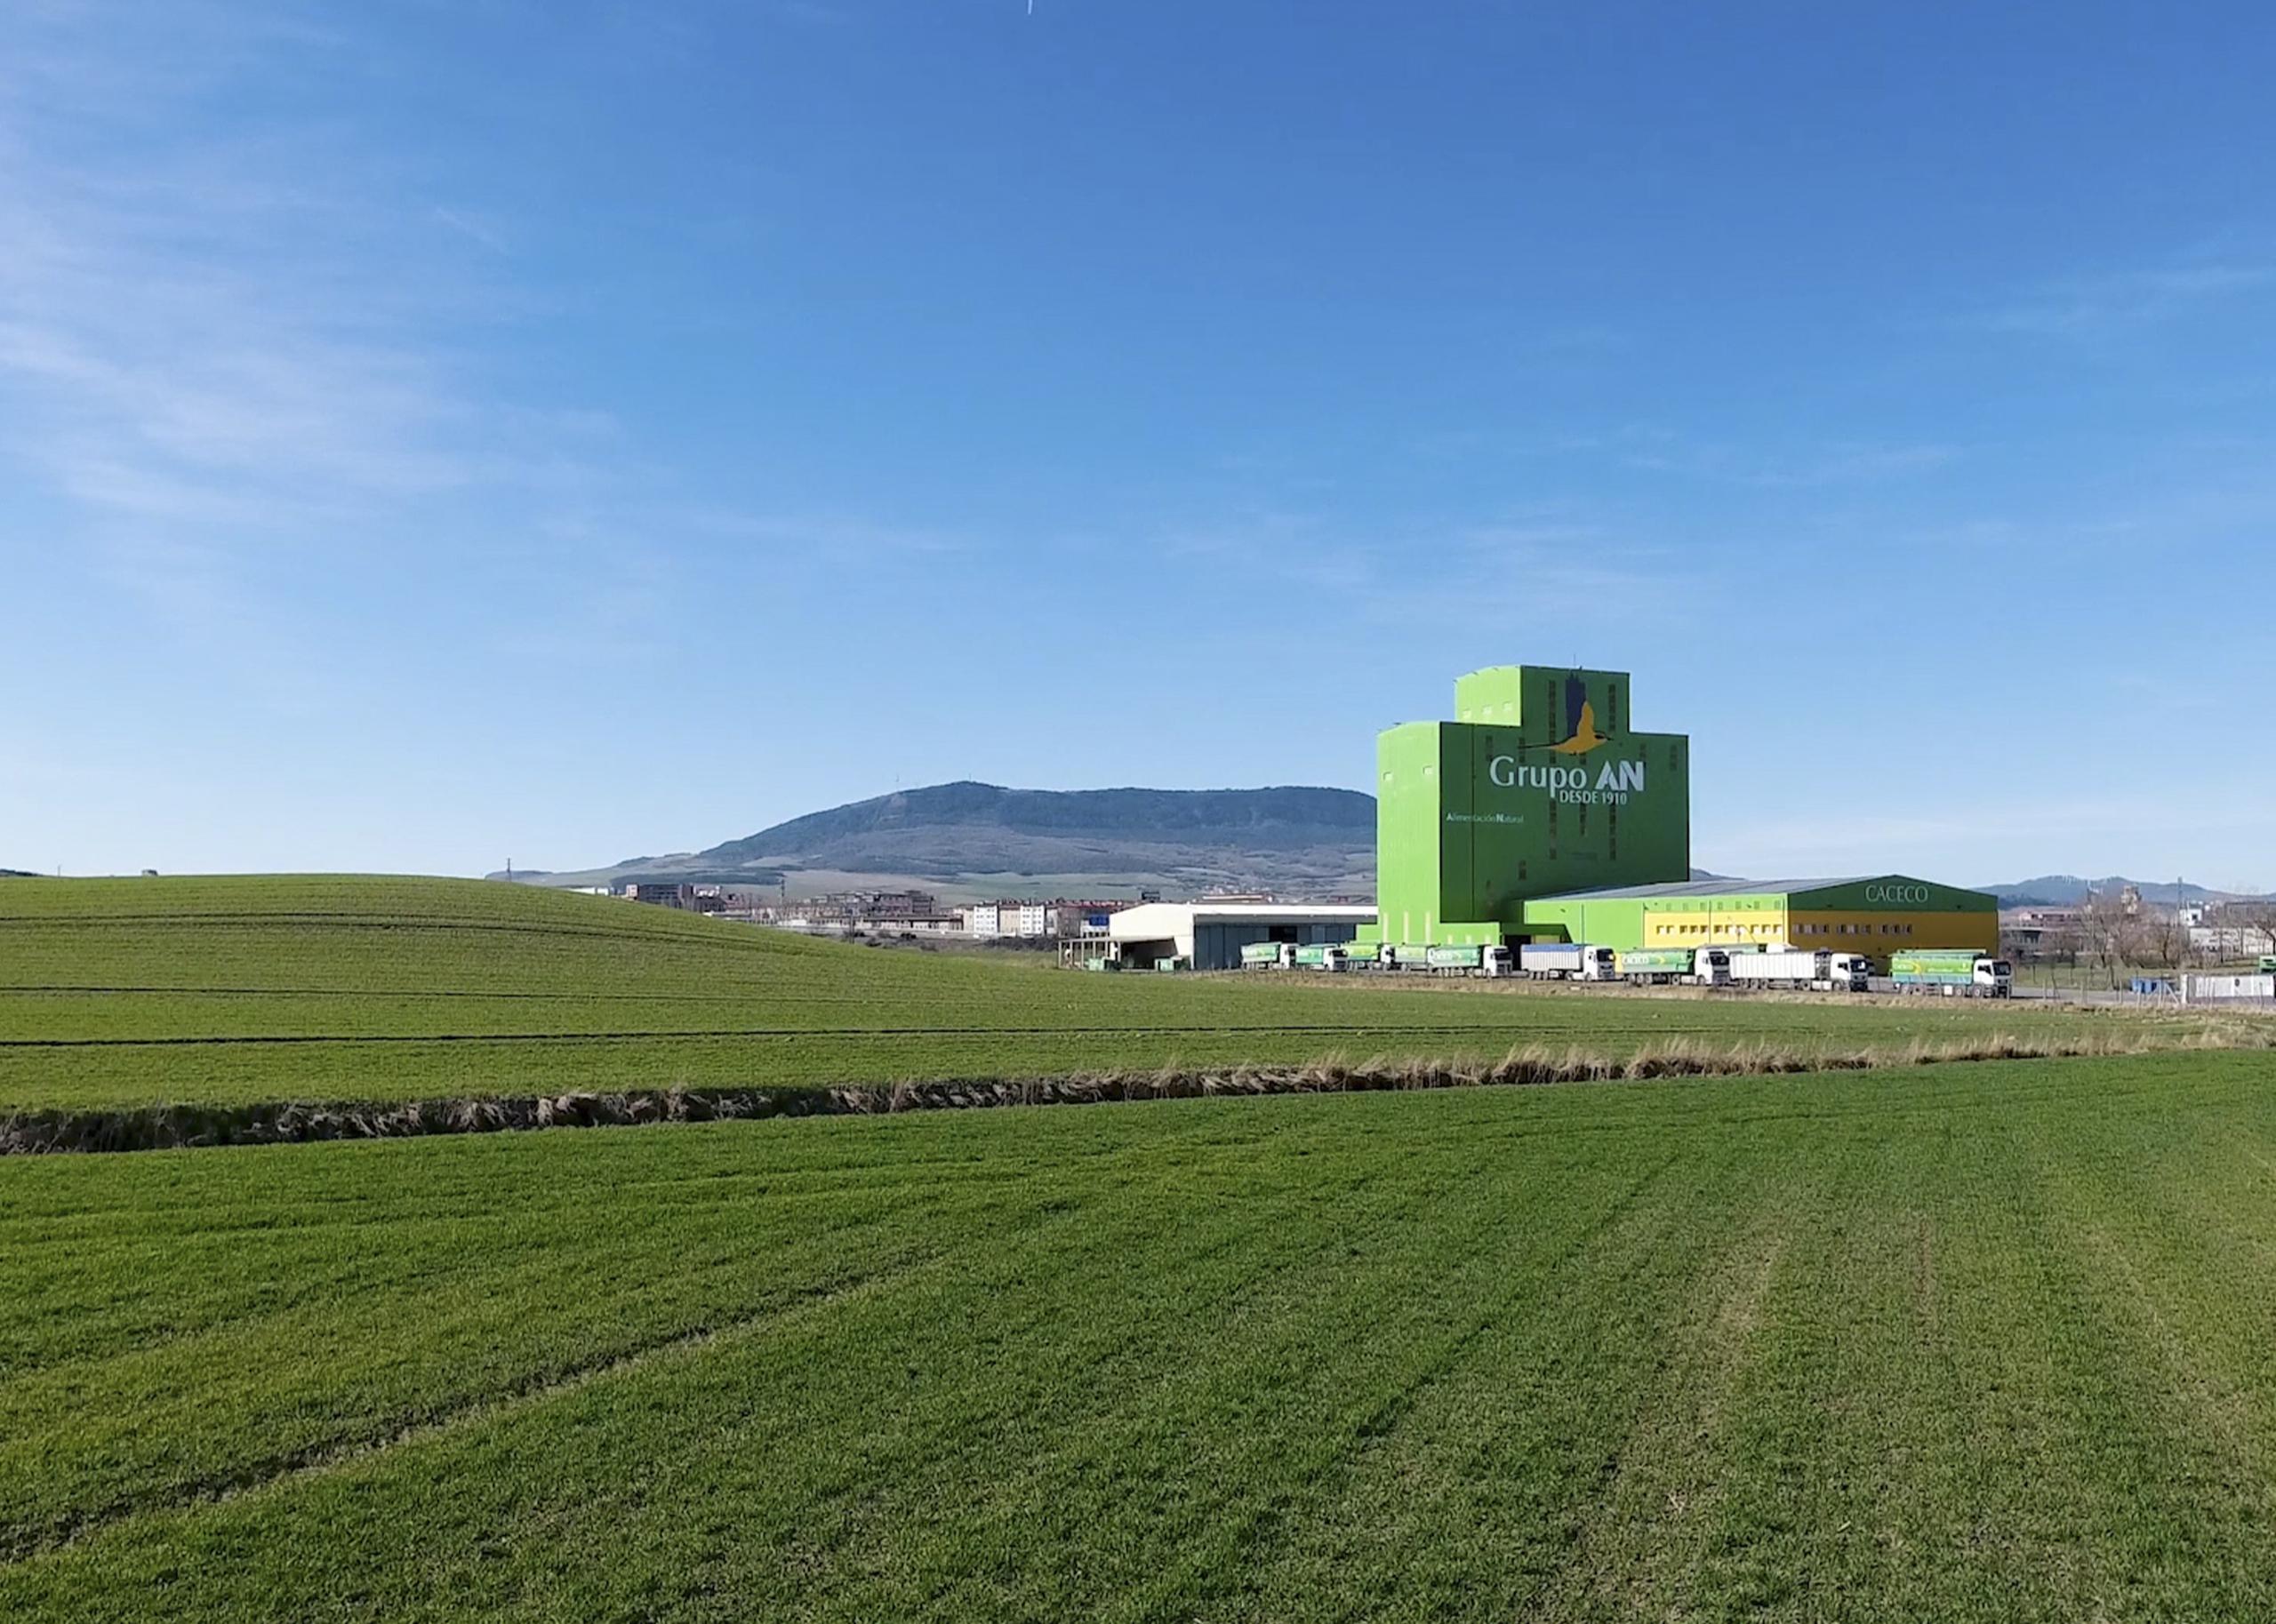 Imagen de la sede central de la cooperativa Grupo AN en Tajonar, Navarra